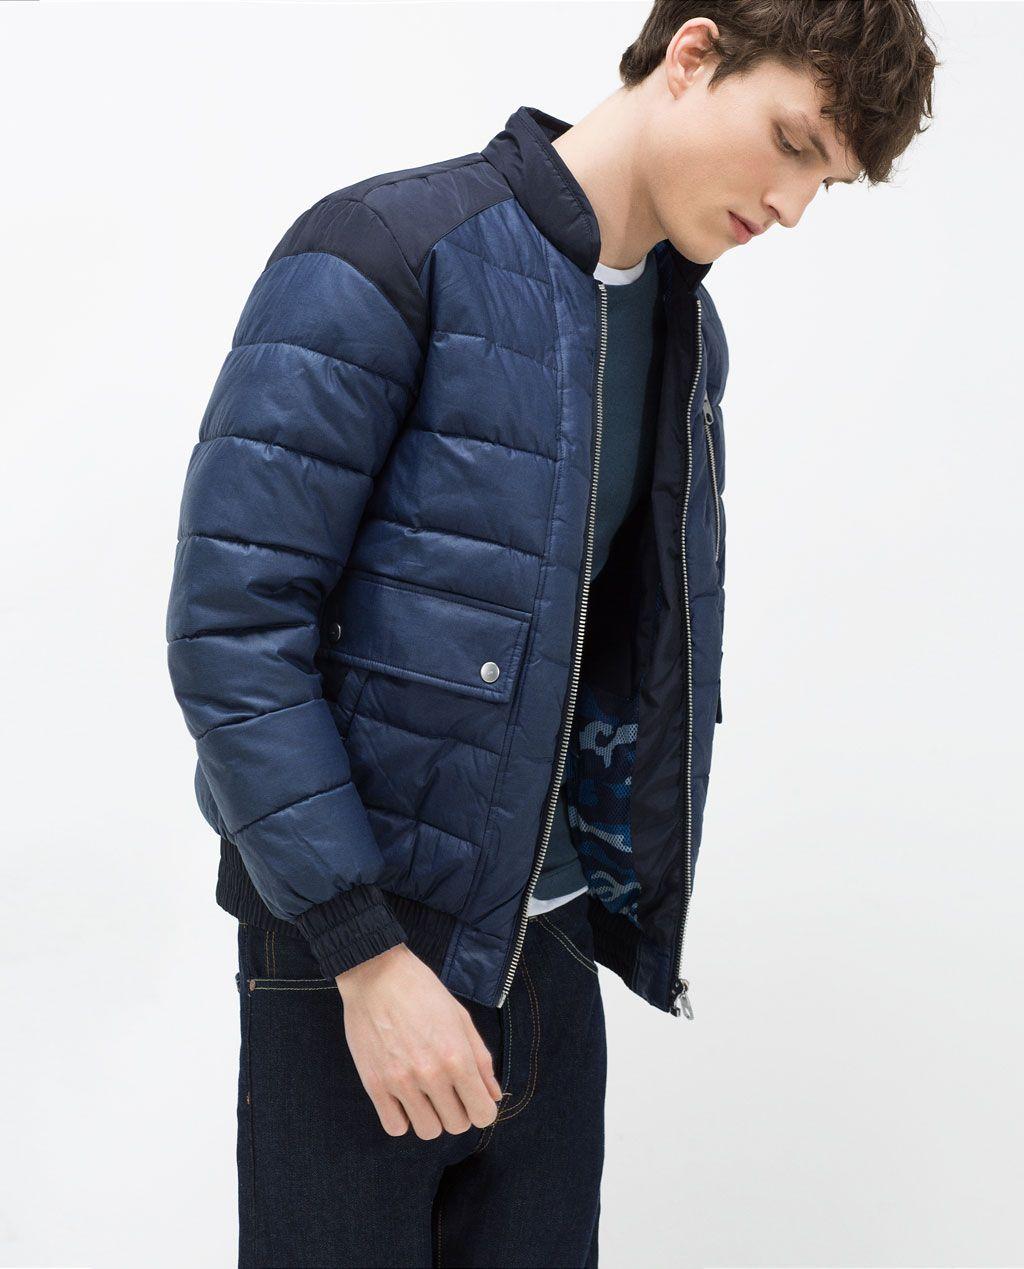 Image 2 of DENIM JACKET from Zara Denim jacket men